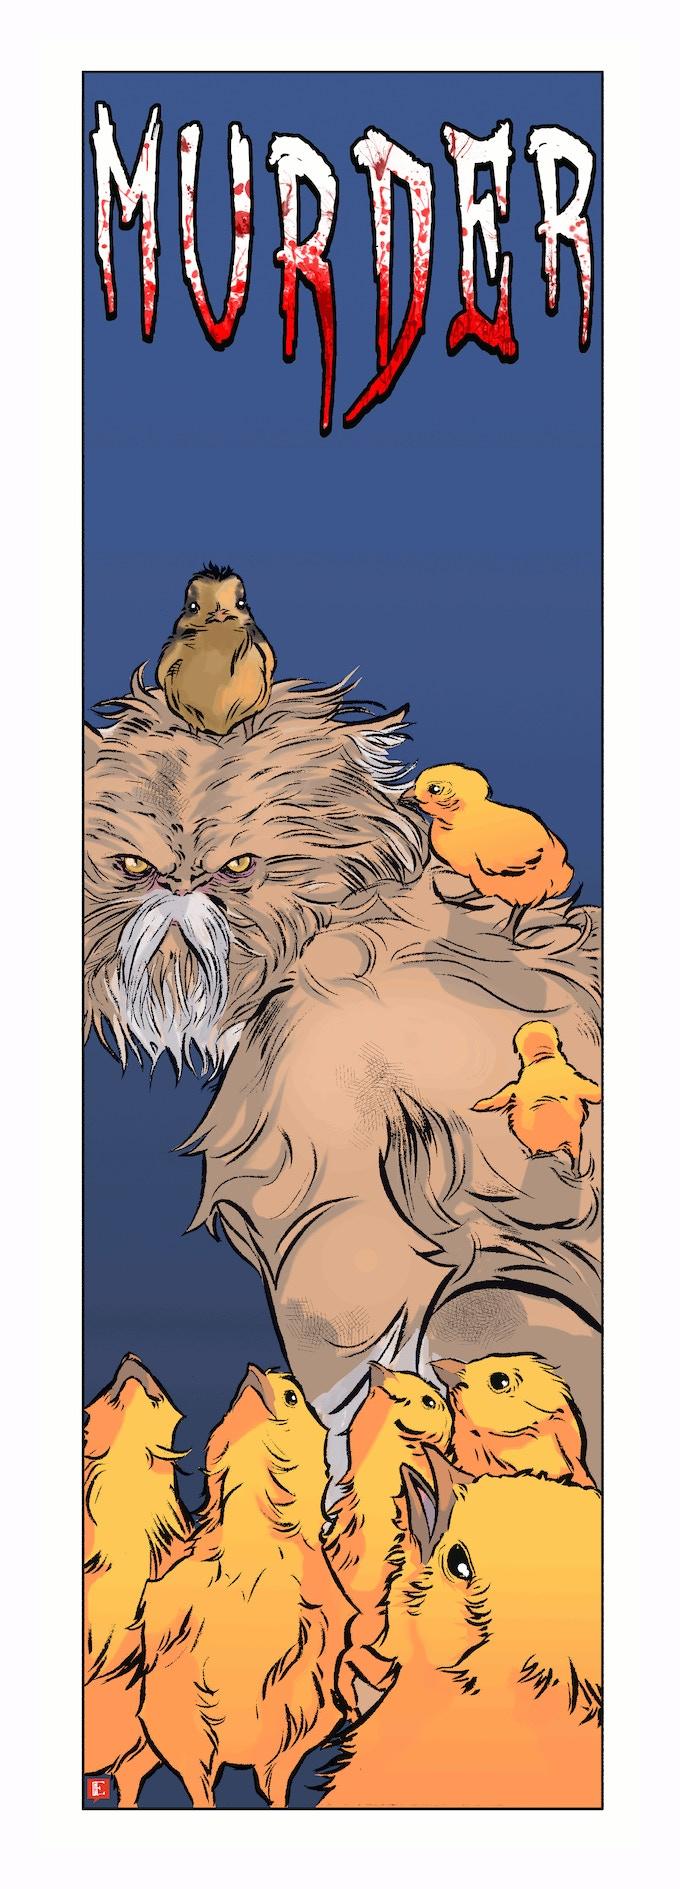 Original bookmark art by Emiliano Correa